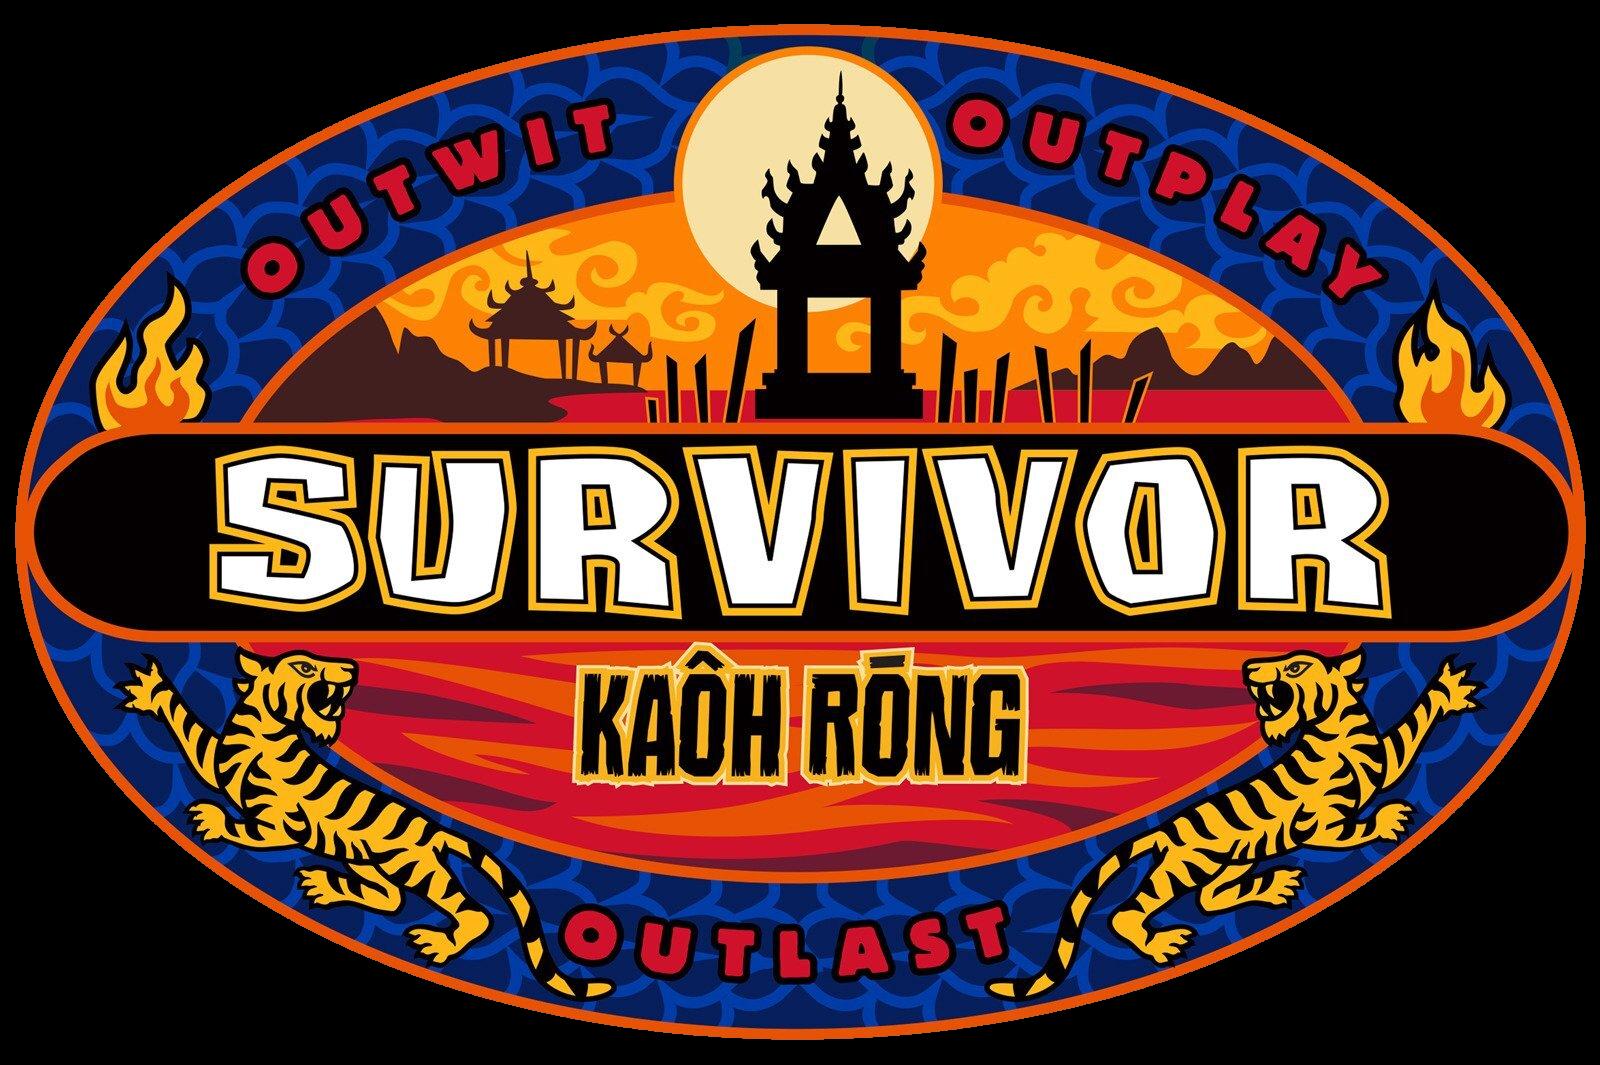 File:Survivor kaoh rong logo.png